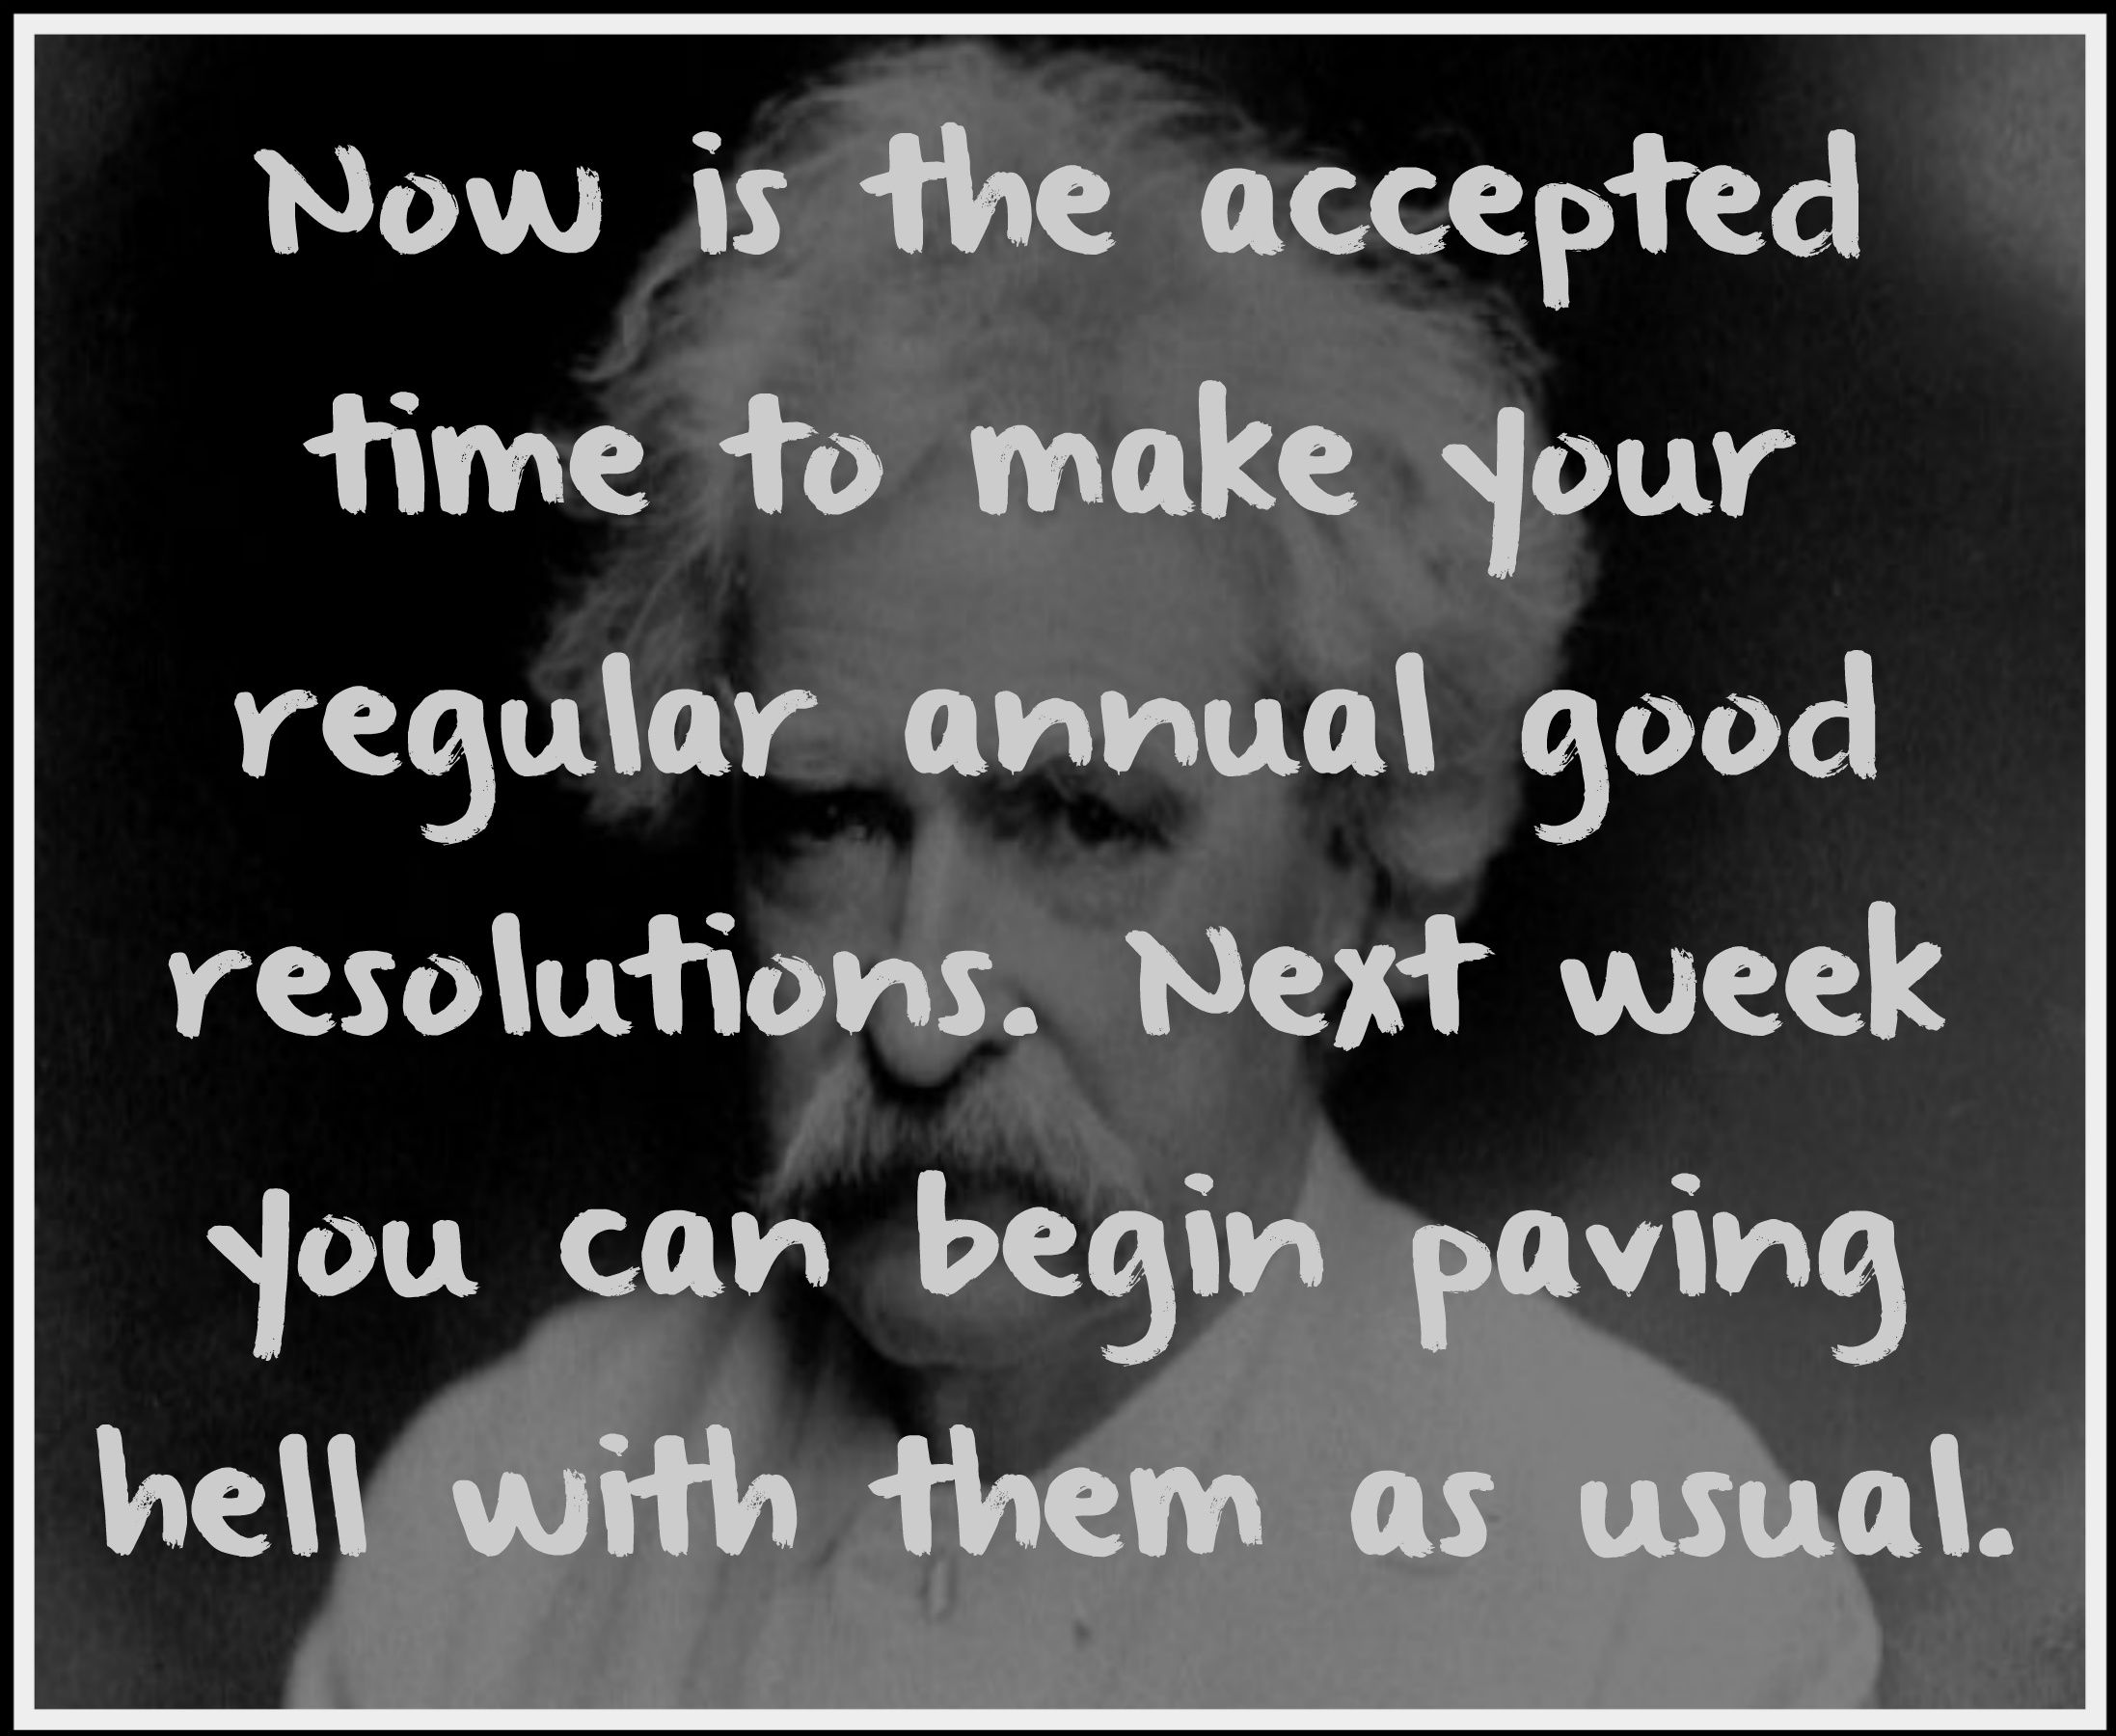 Mark Twain On New Years Eve Resolutions Musings Mark Twain